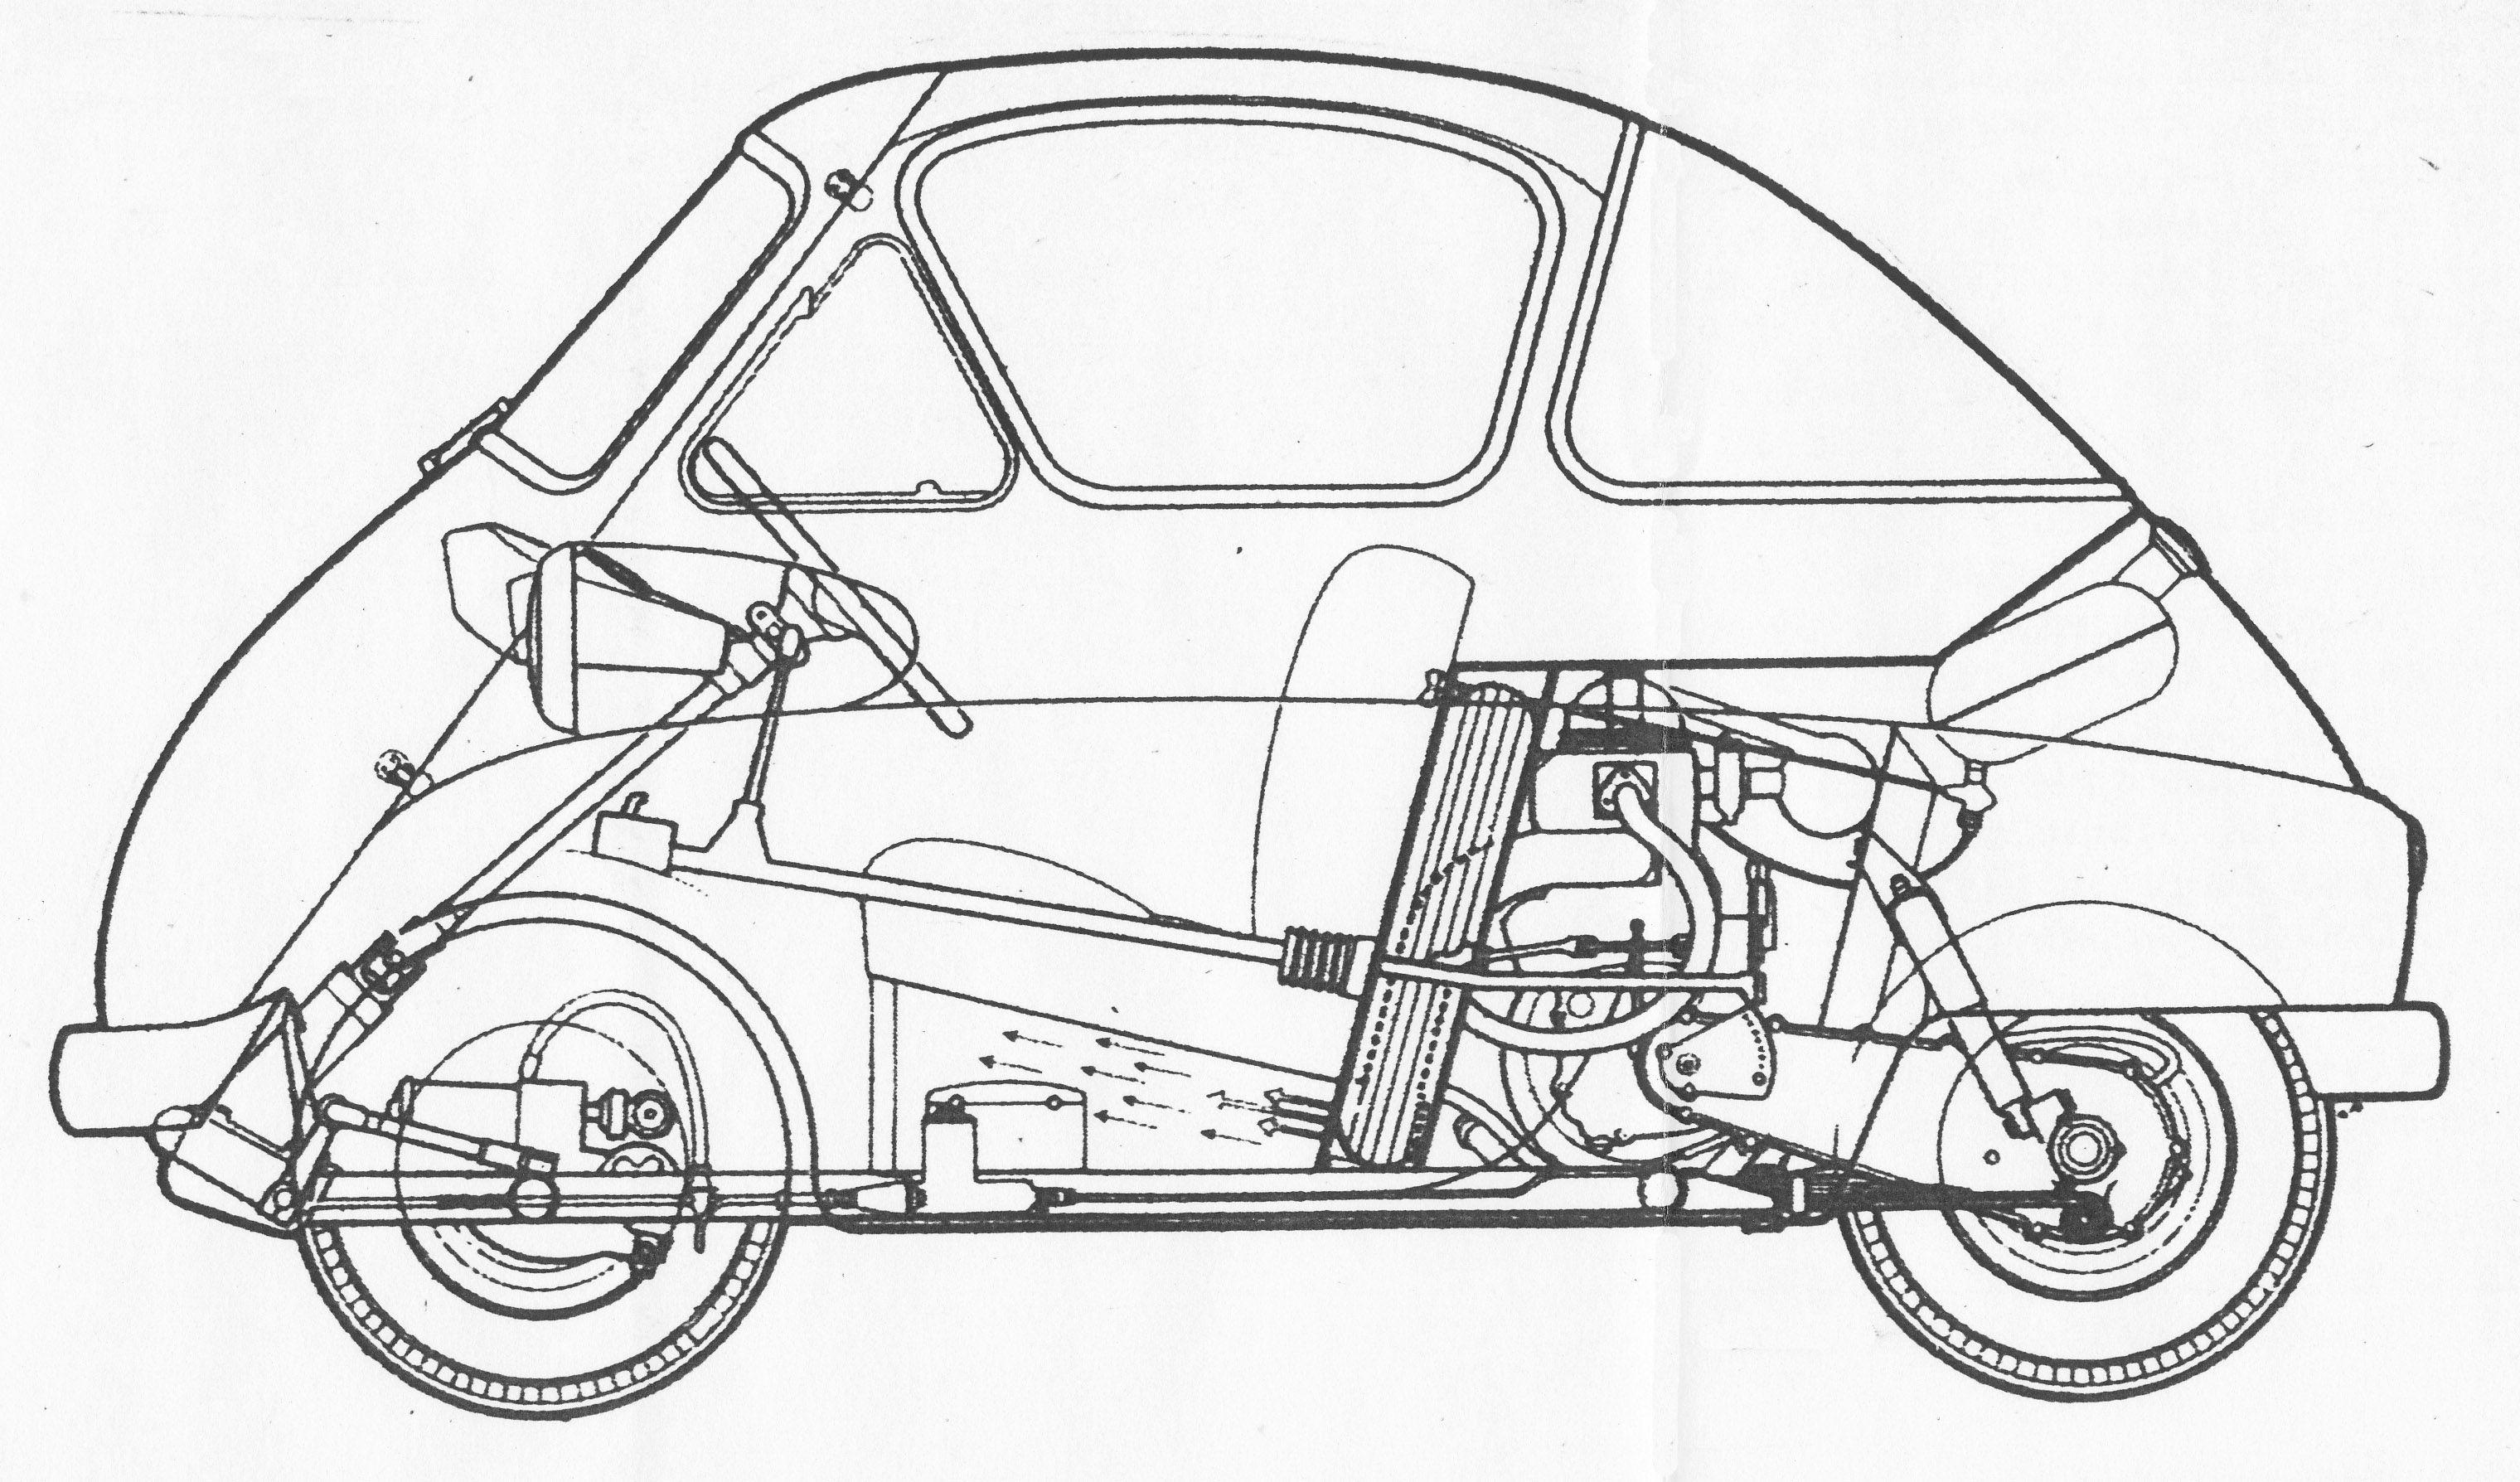 Bmw isetta 1959 smcars car blueprints forum automobilia bmw isetta 1959 smcars car blueprints forum malvernweather Image collections